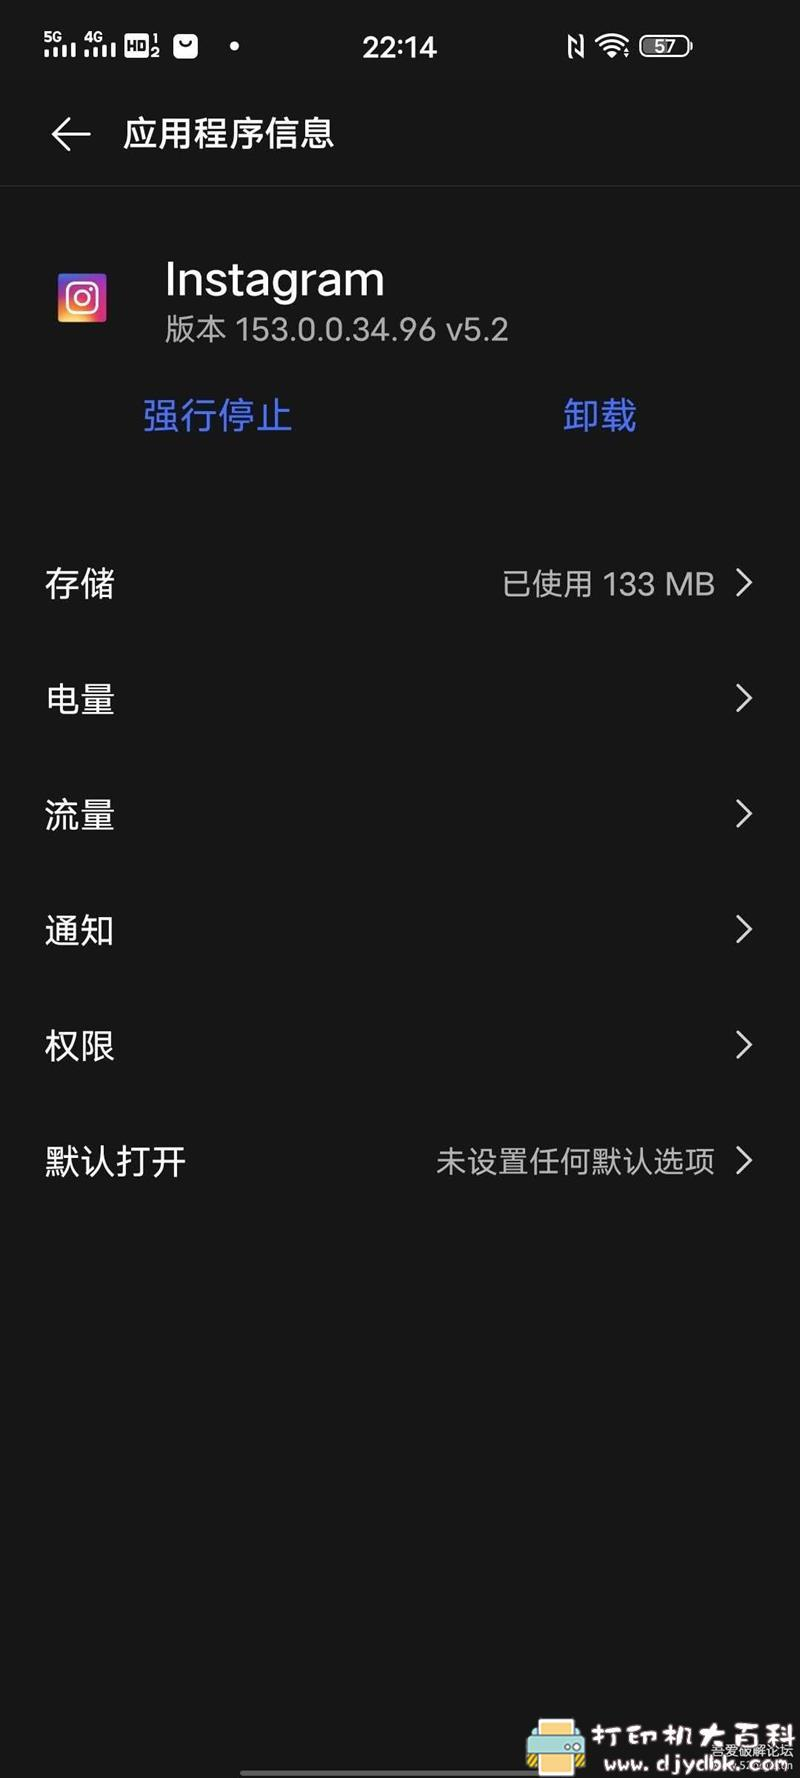 [Android]Instagram 156.0.0.26.109 V5.2 解锁更多功能 配图 No.2